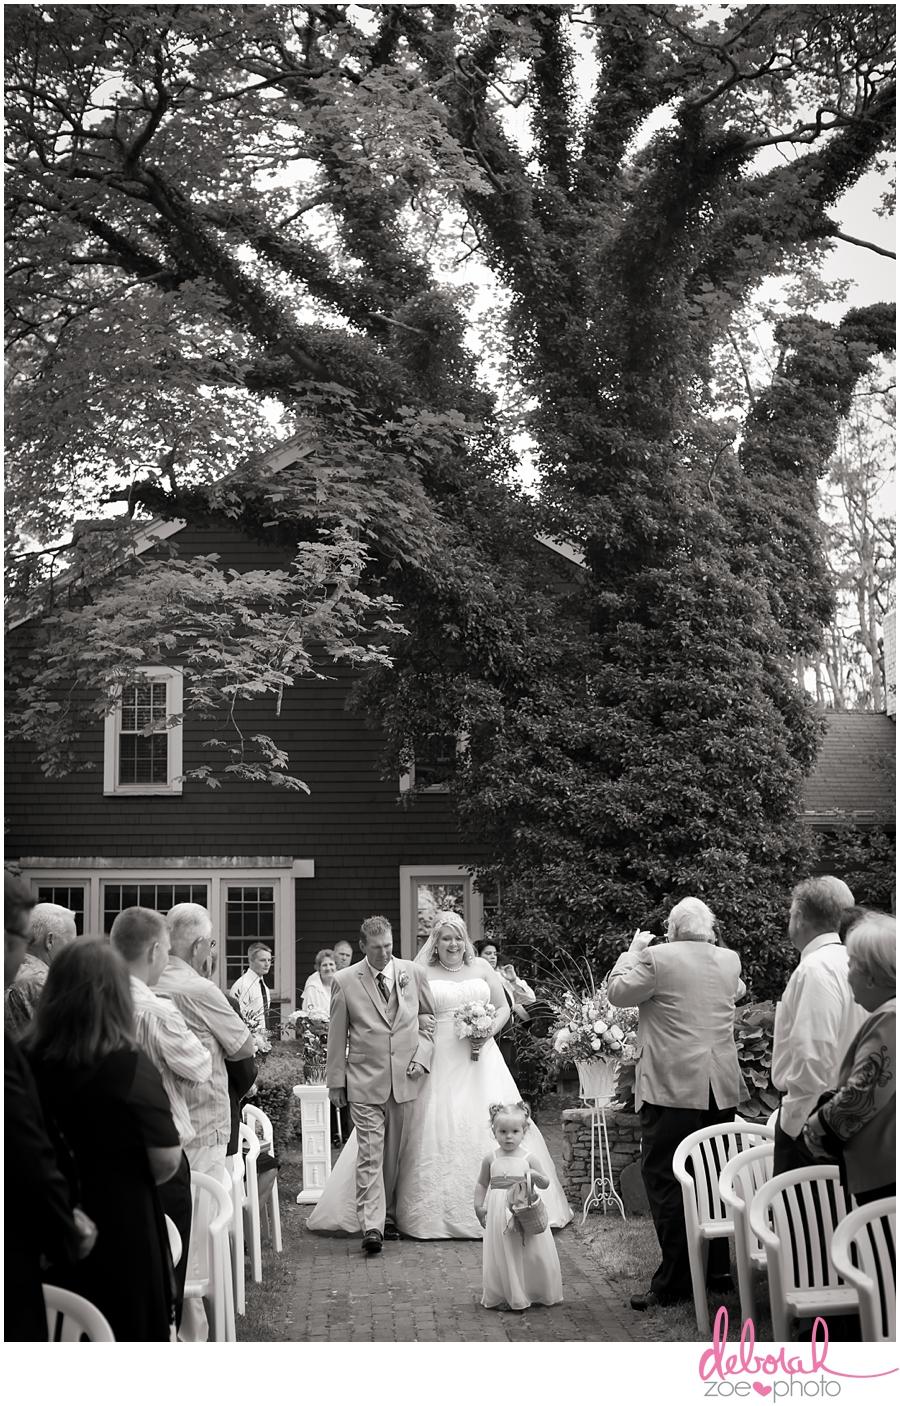 Cape Cod Wedding Massachusetts Wedding Photographer Summer Wedding Outdoor Ceremony Pink Wedding Details Ocean Themed Wedding Coonamessett Inn Wedding Deborah Zoe Photo018